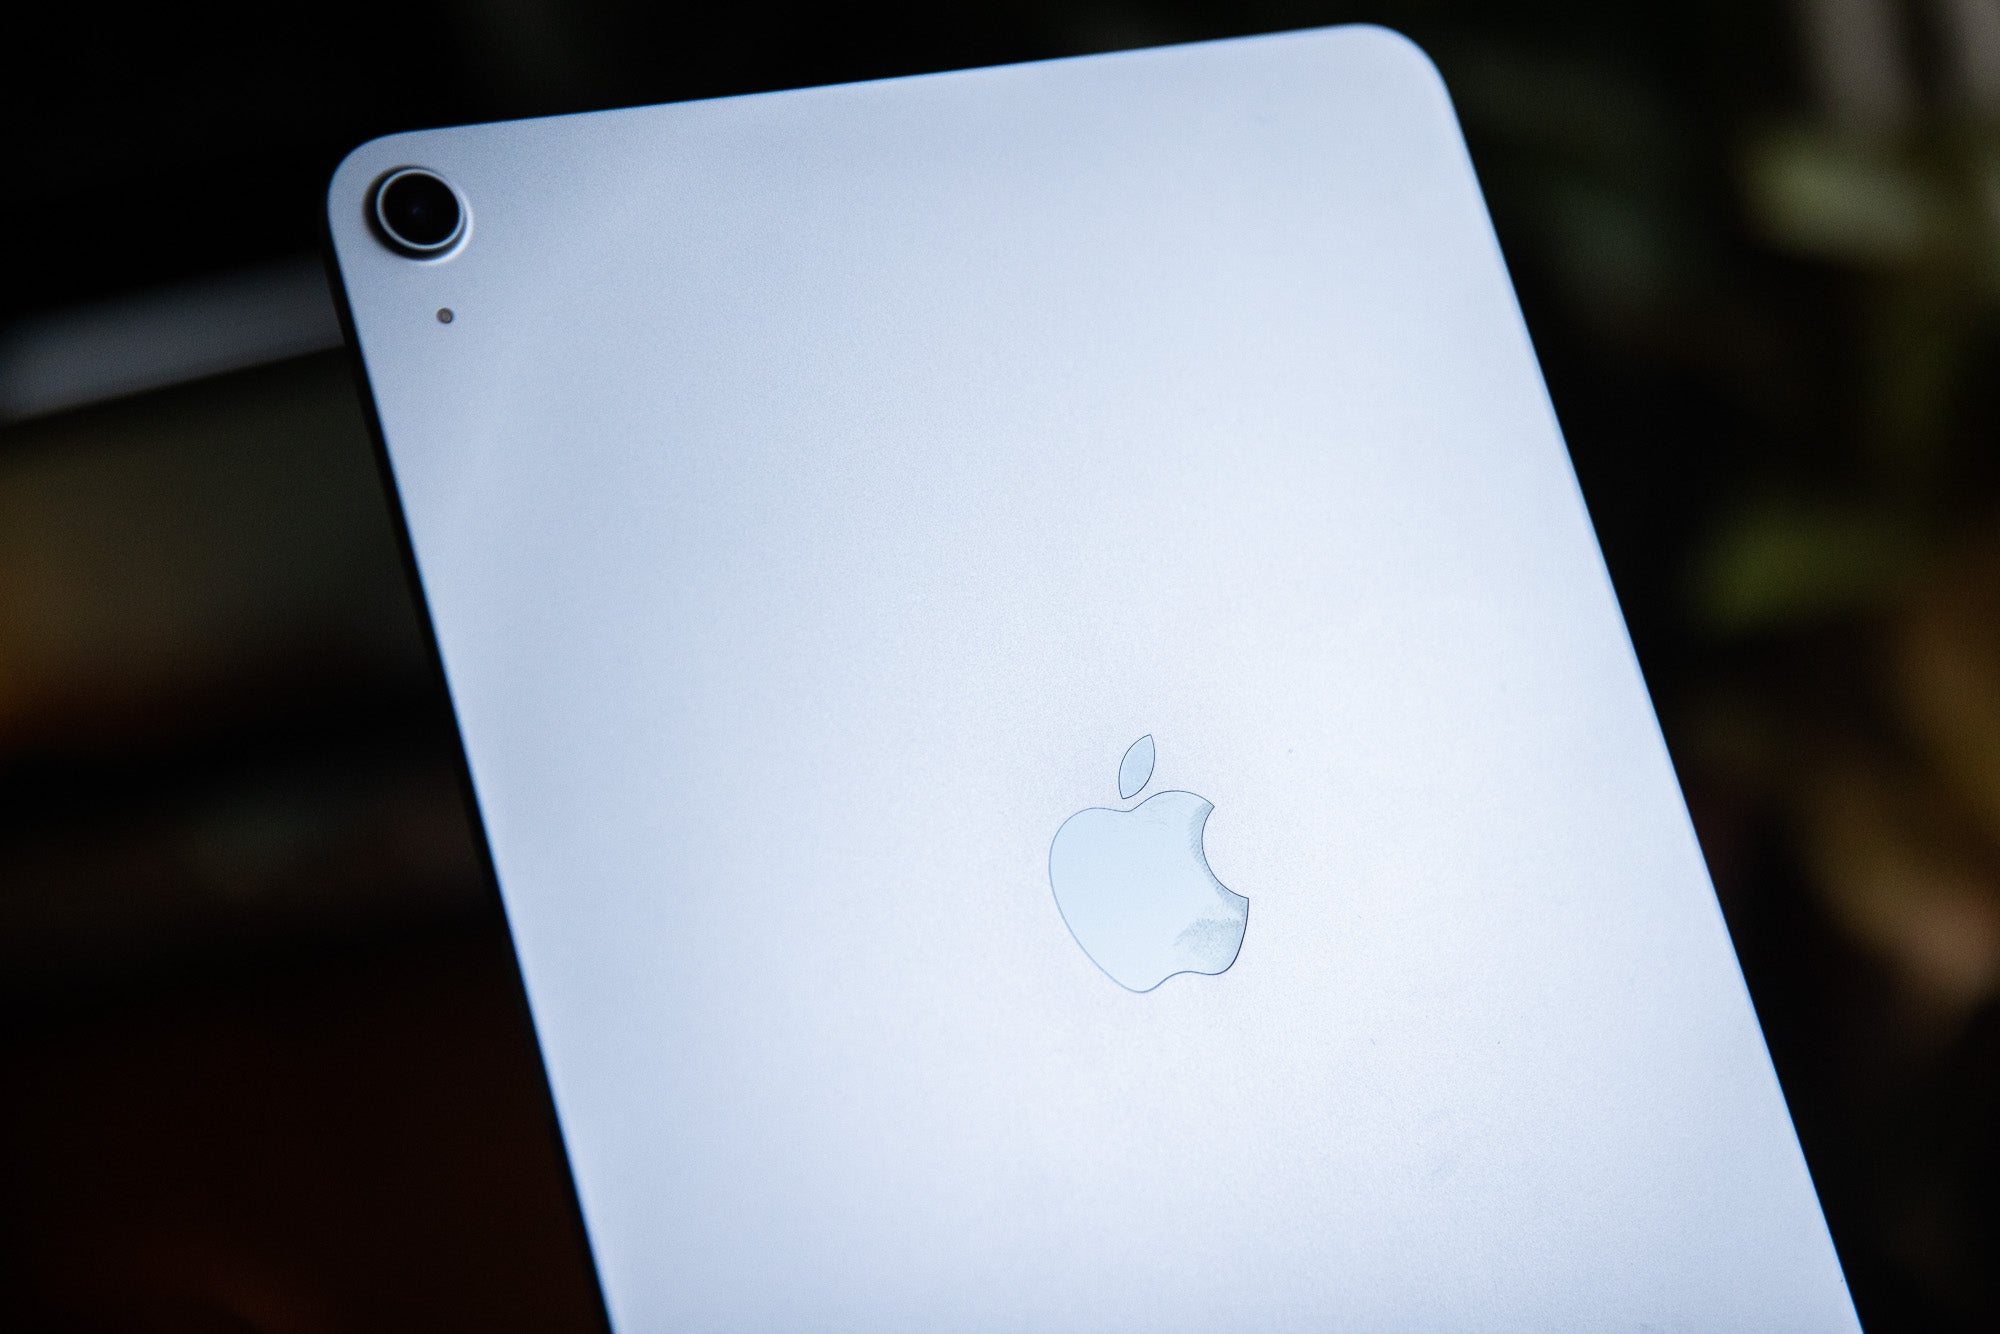 An iPad against a dark background